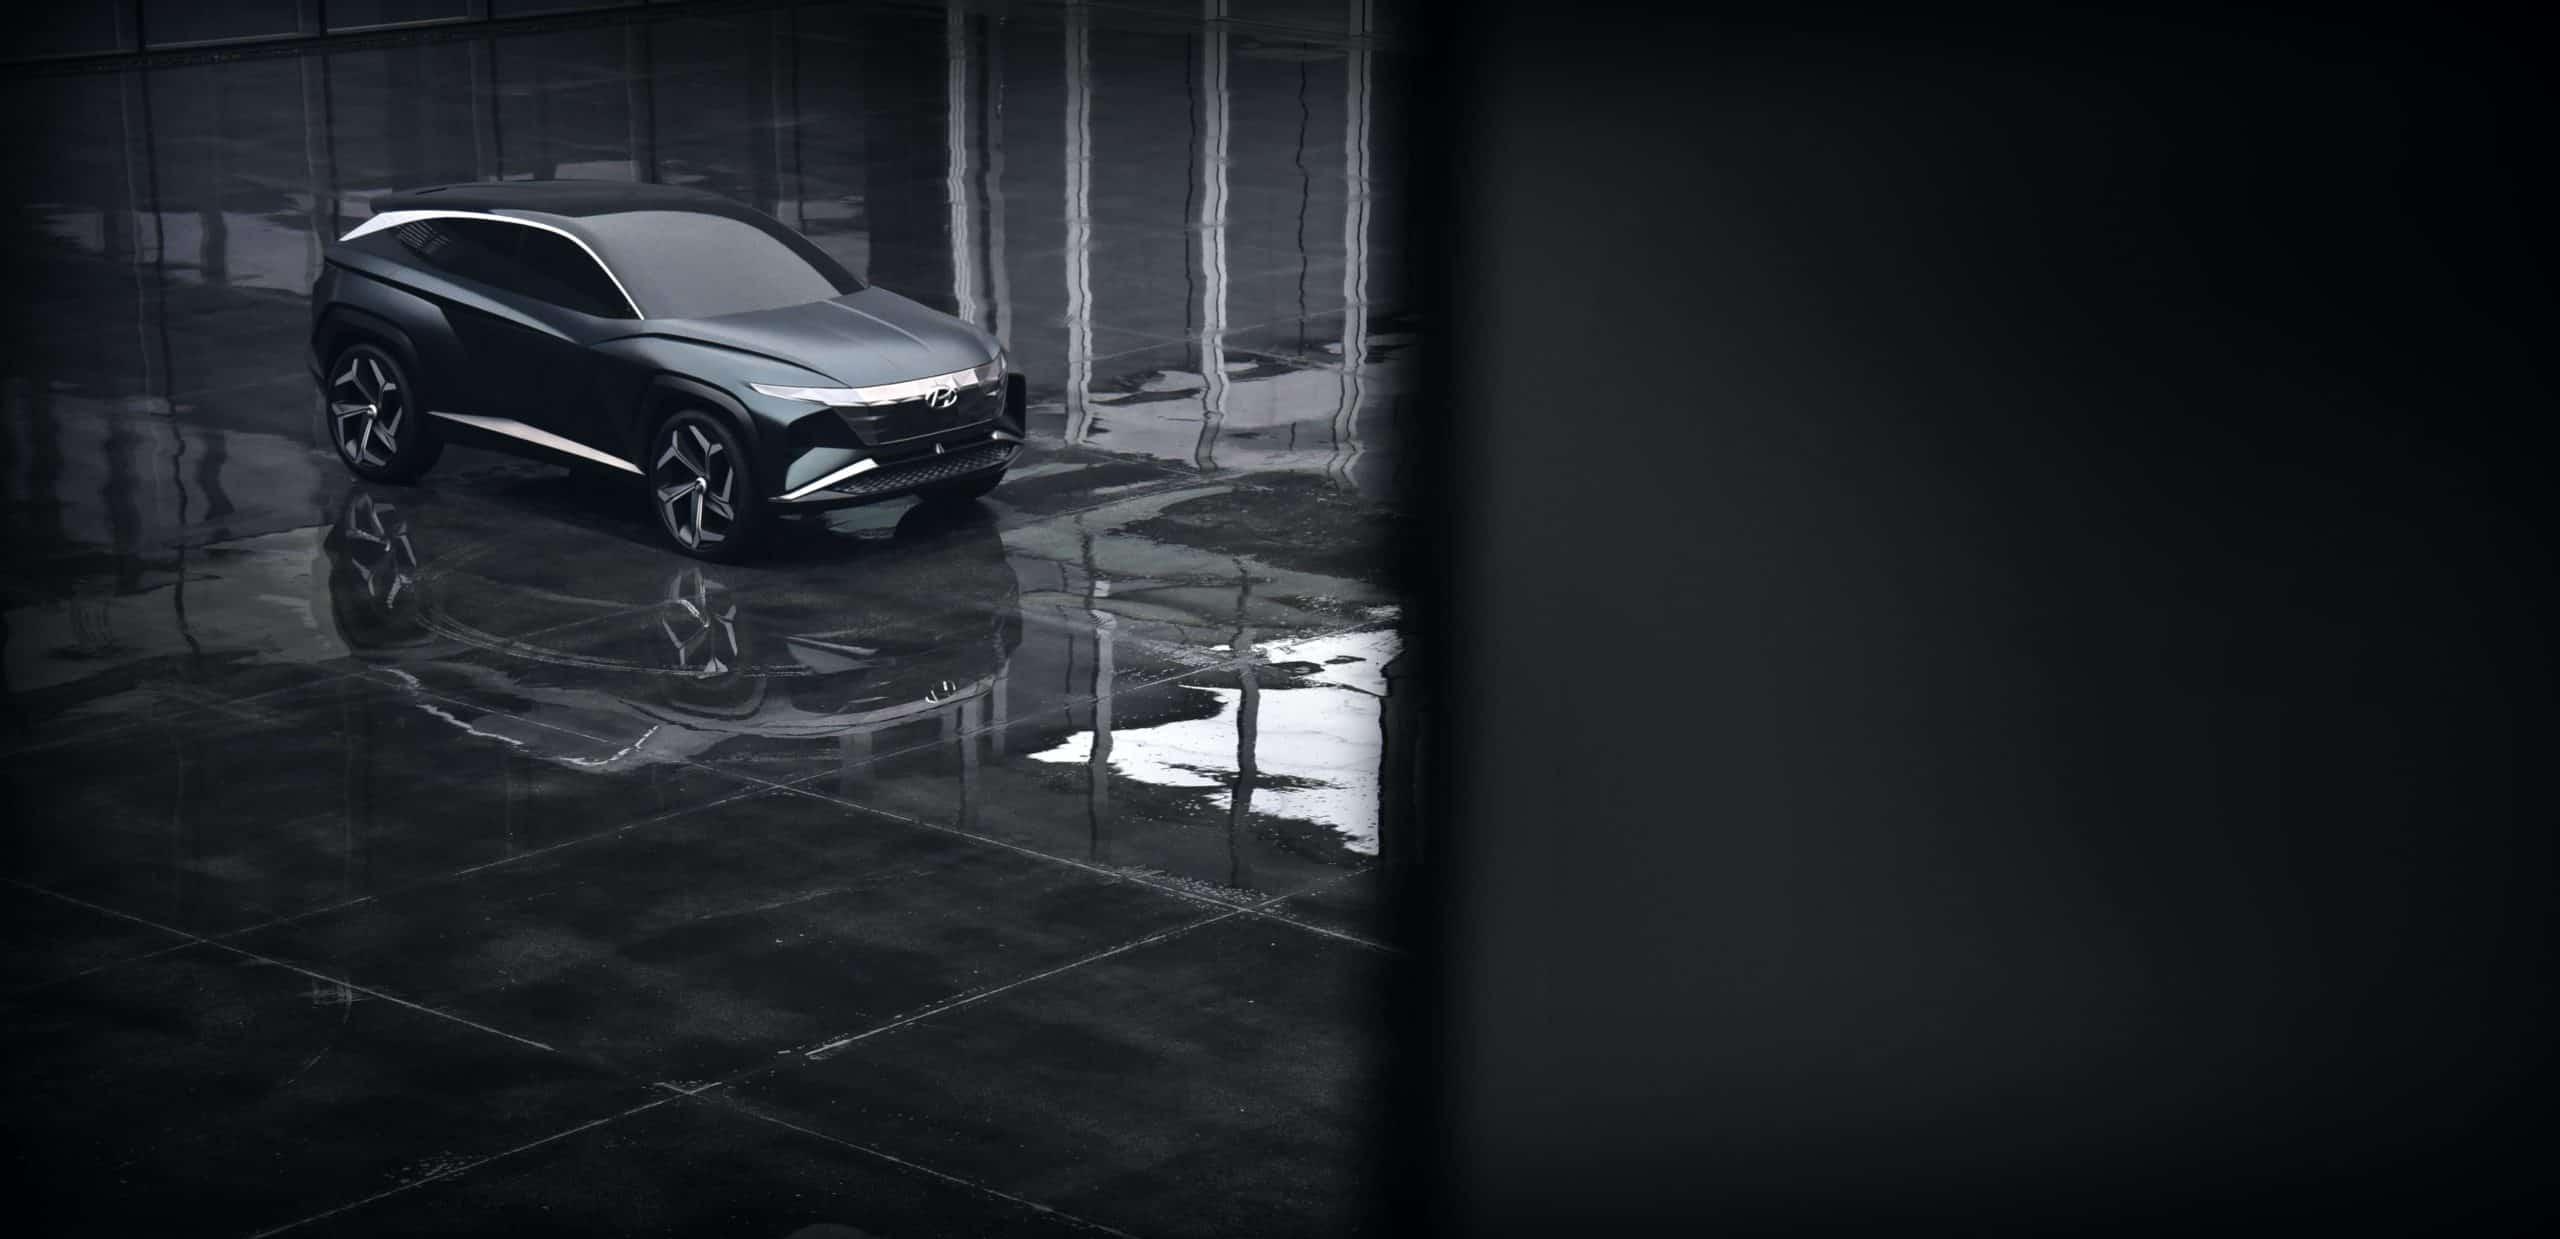 Hyundai Vision T Plug In Hybrid SUV Concept SUV